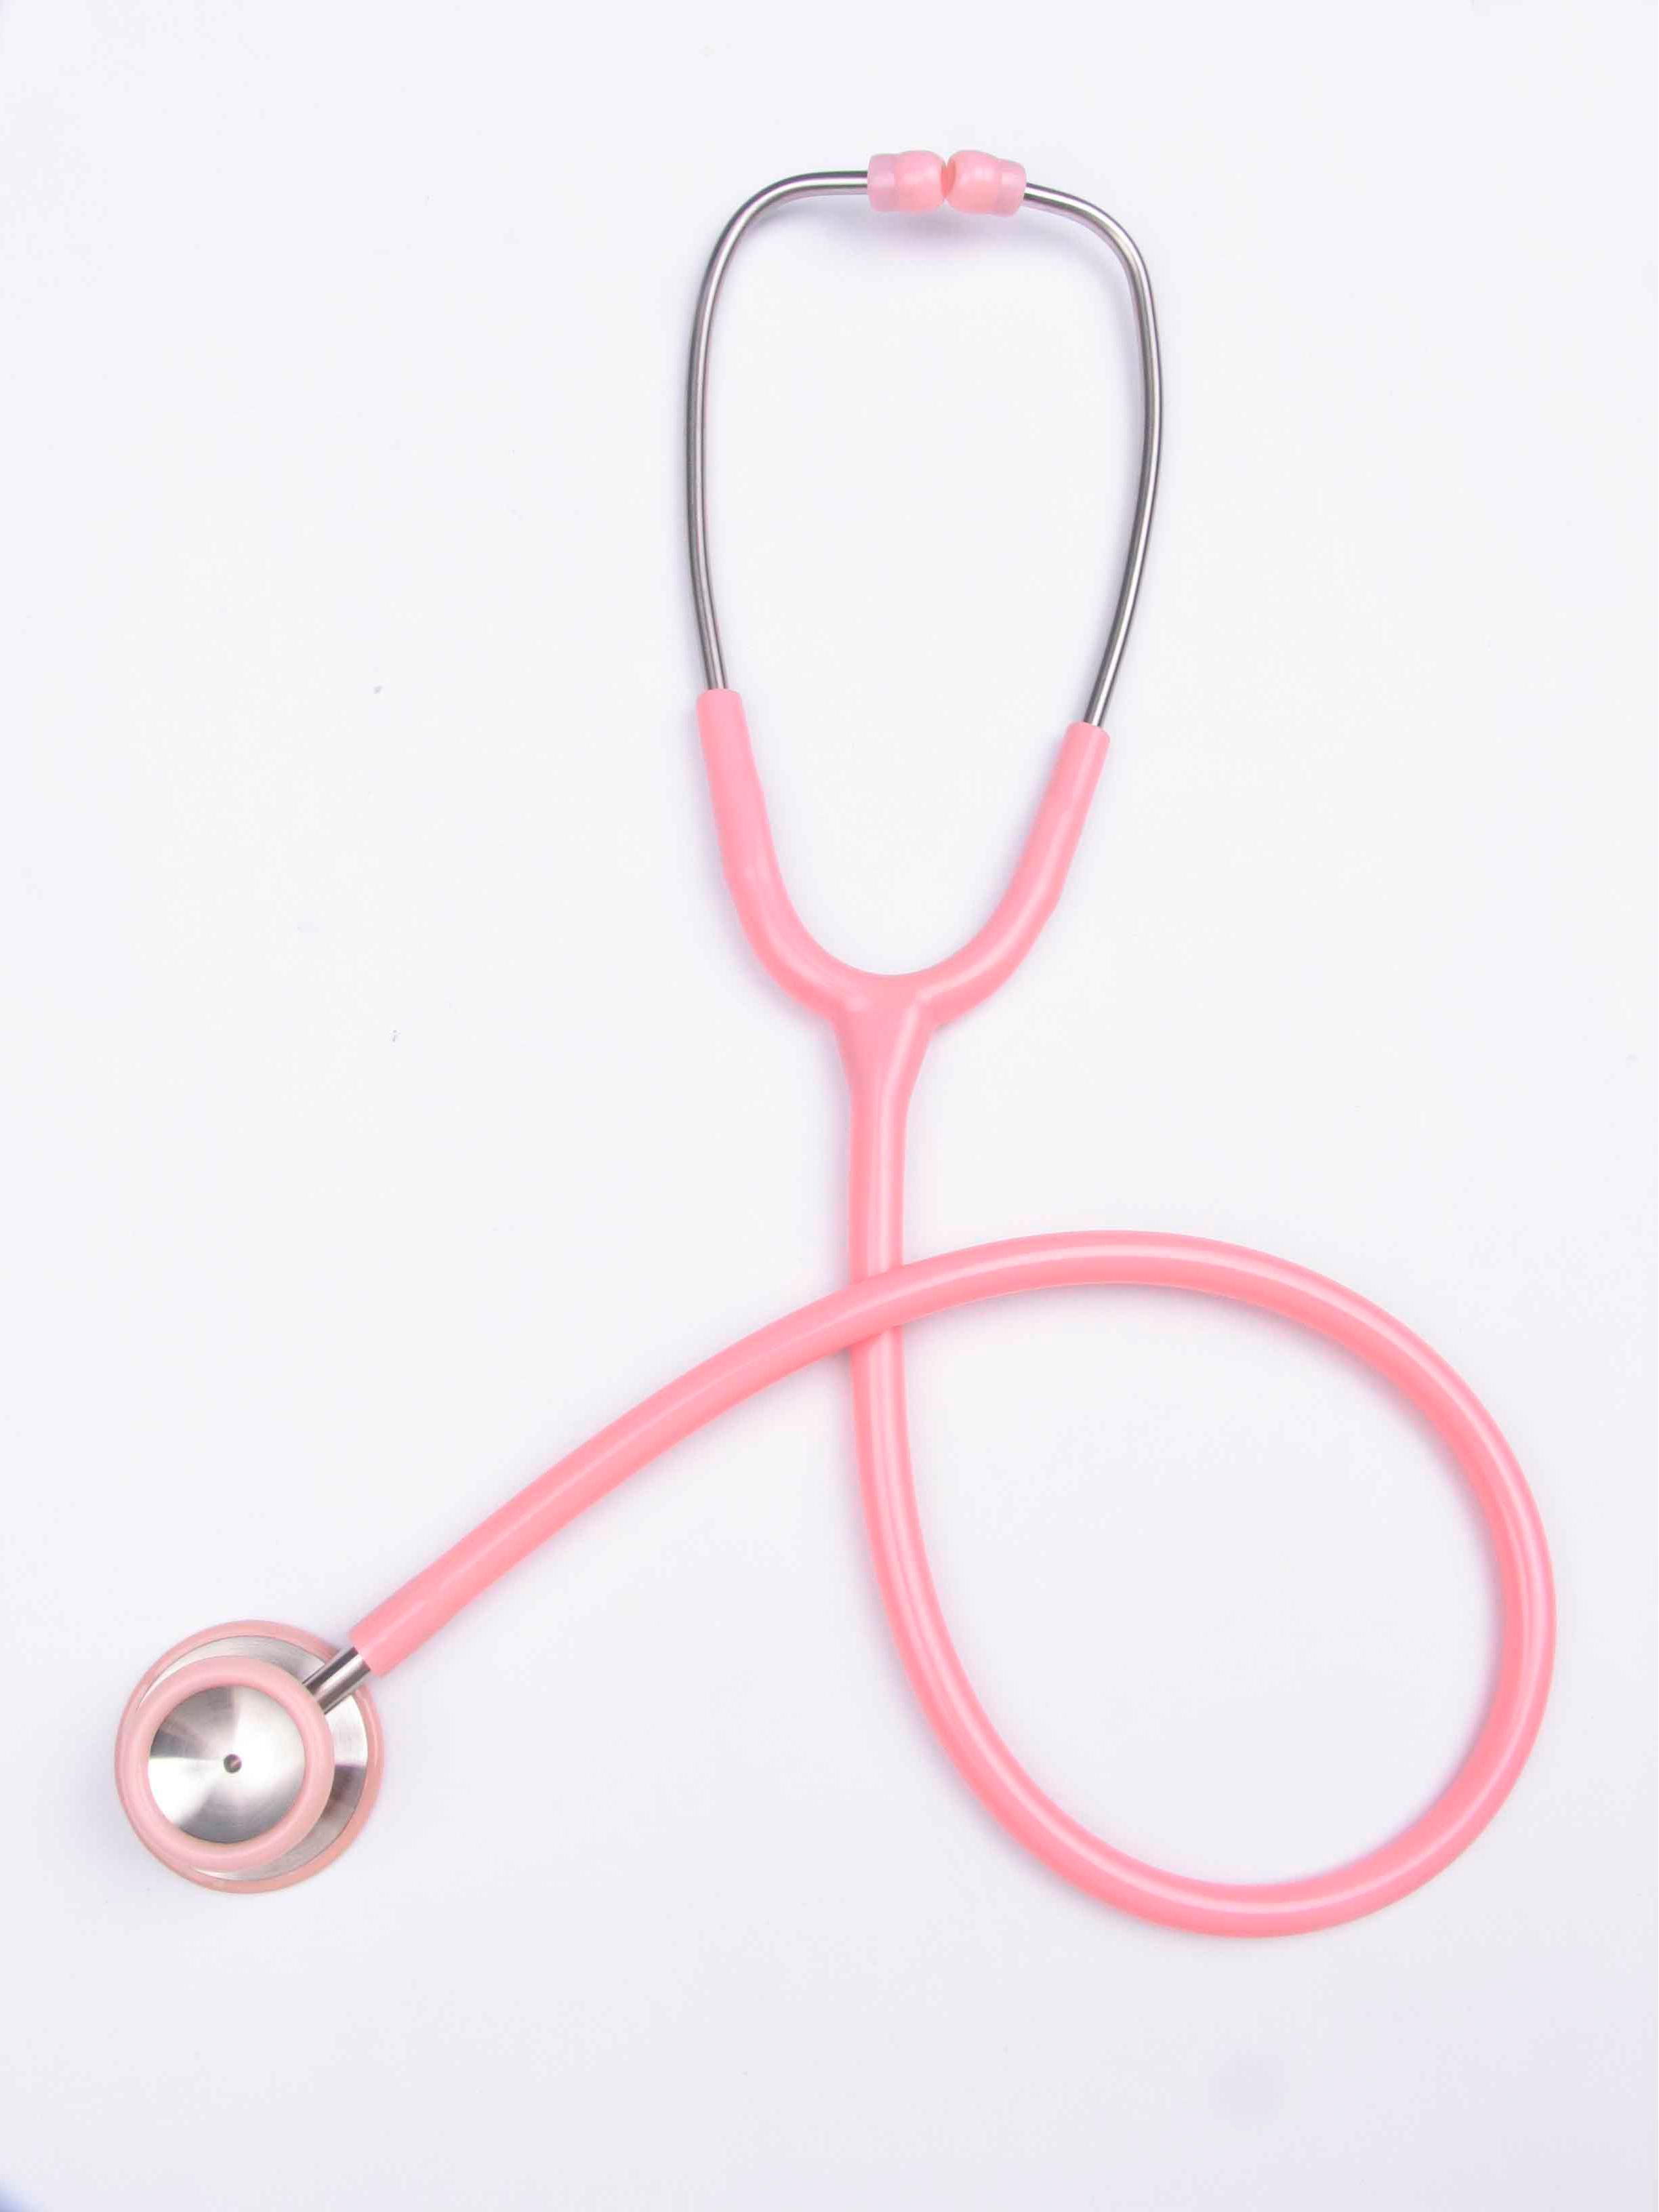 China Classic Stainless Steel Stethoscope (Pediatric ...